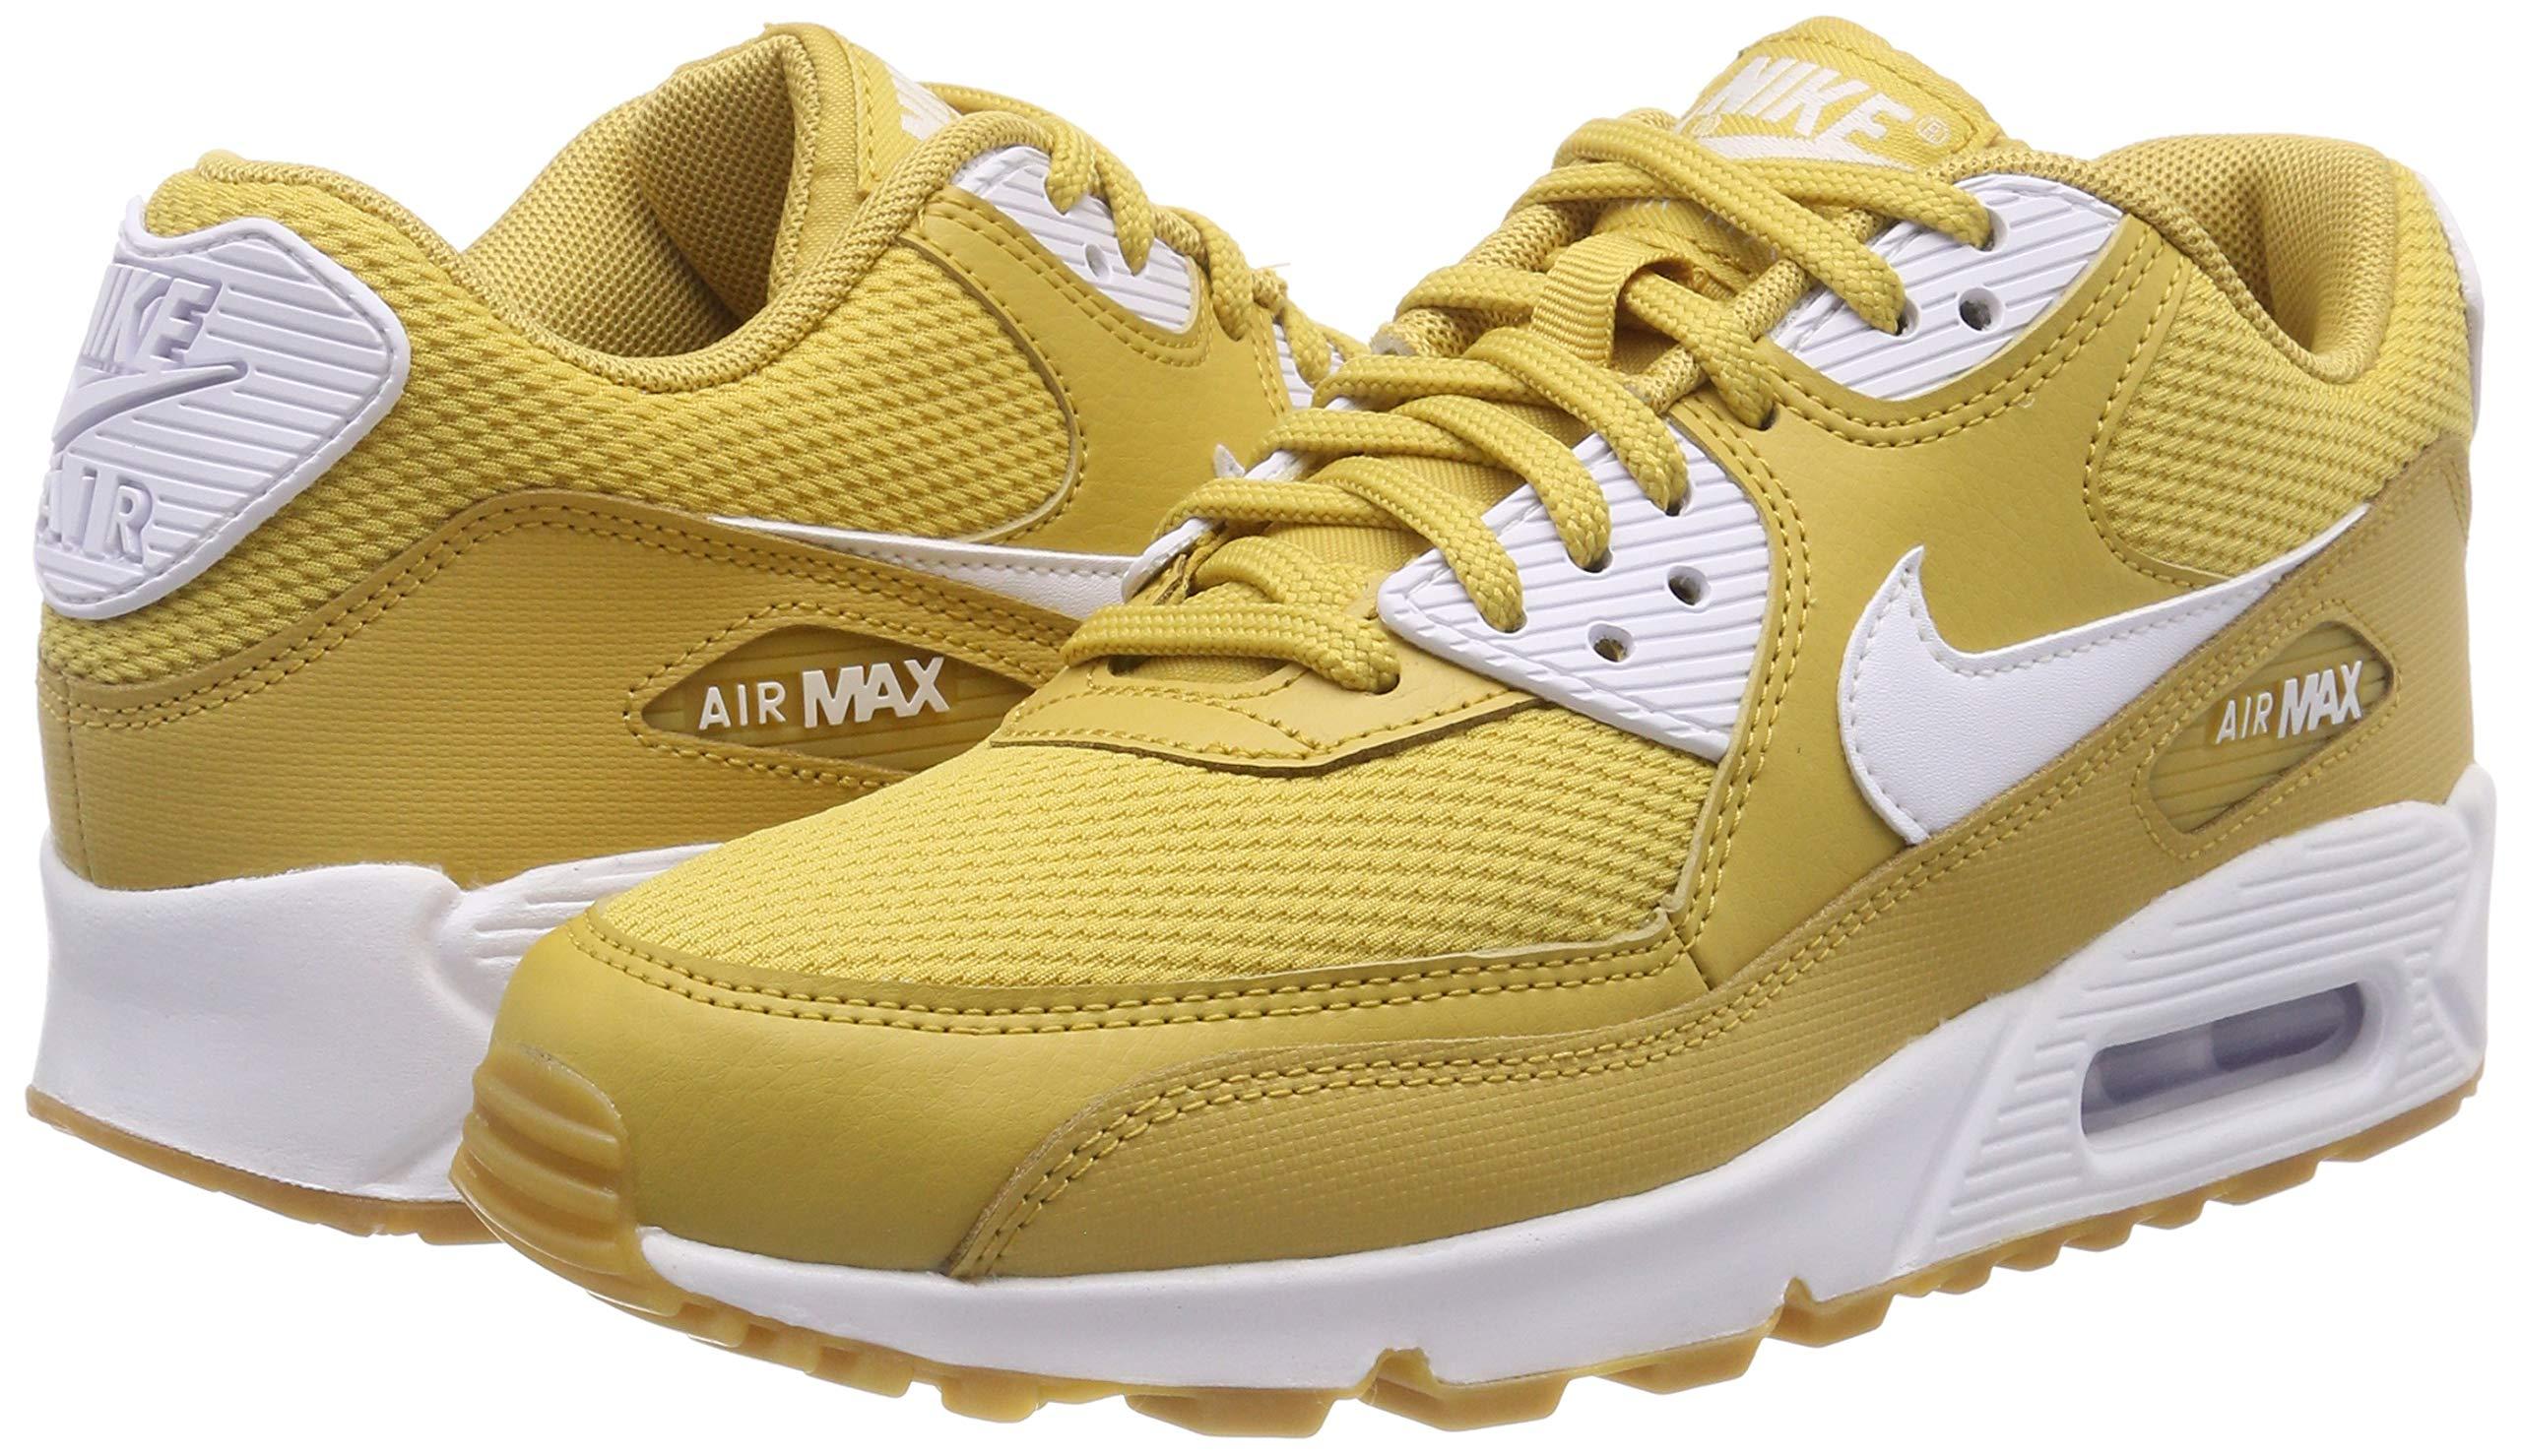 Zapatos NIKE Air Max 90 325213 701 Wheat GoldWhite